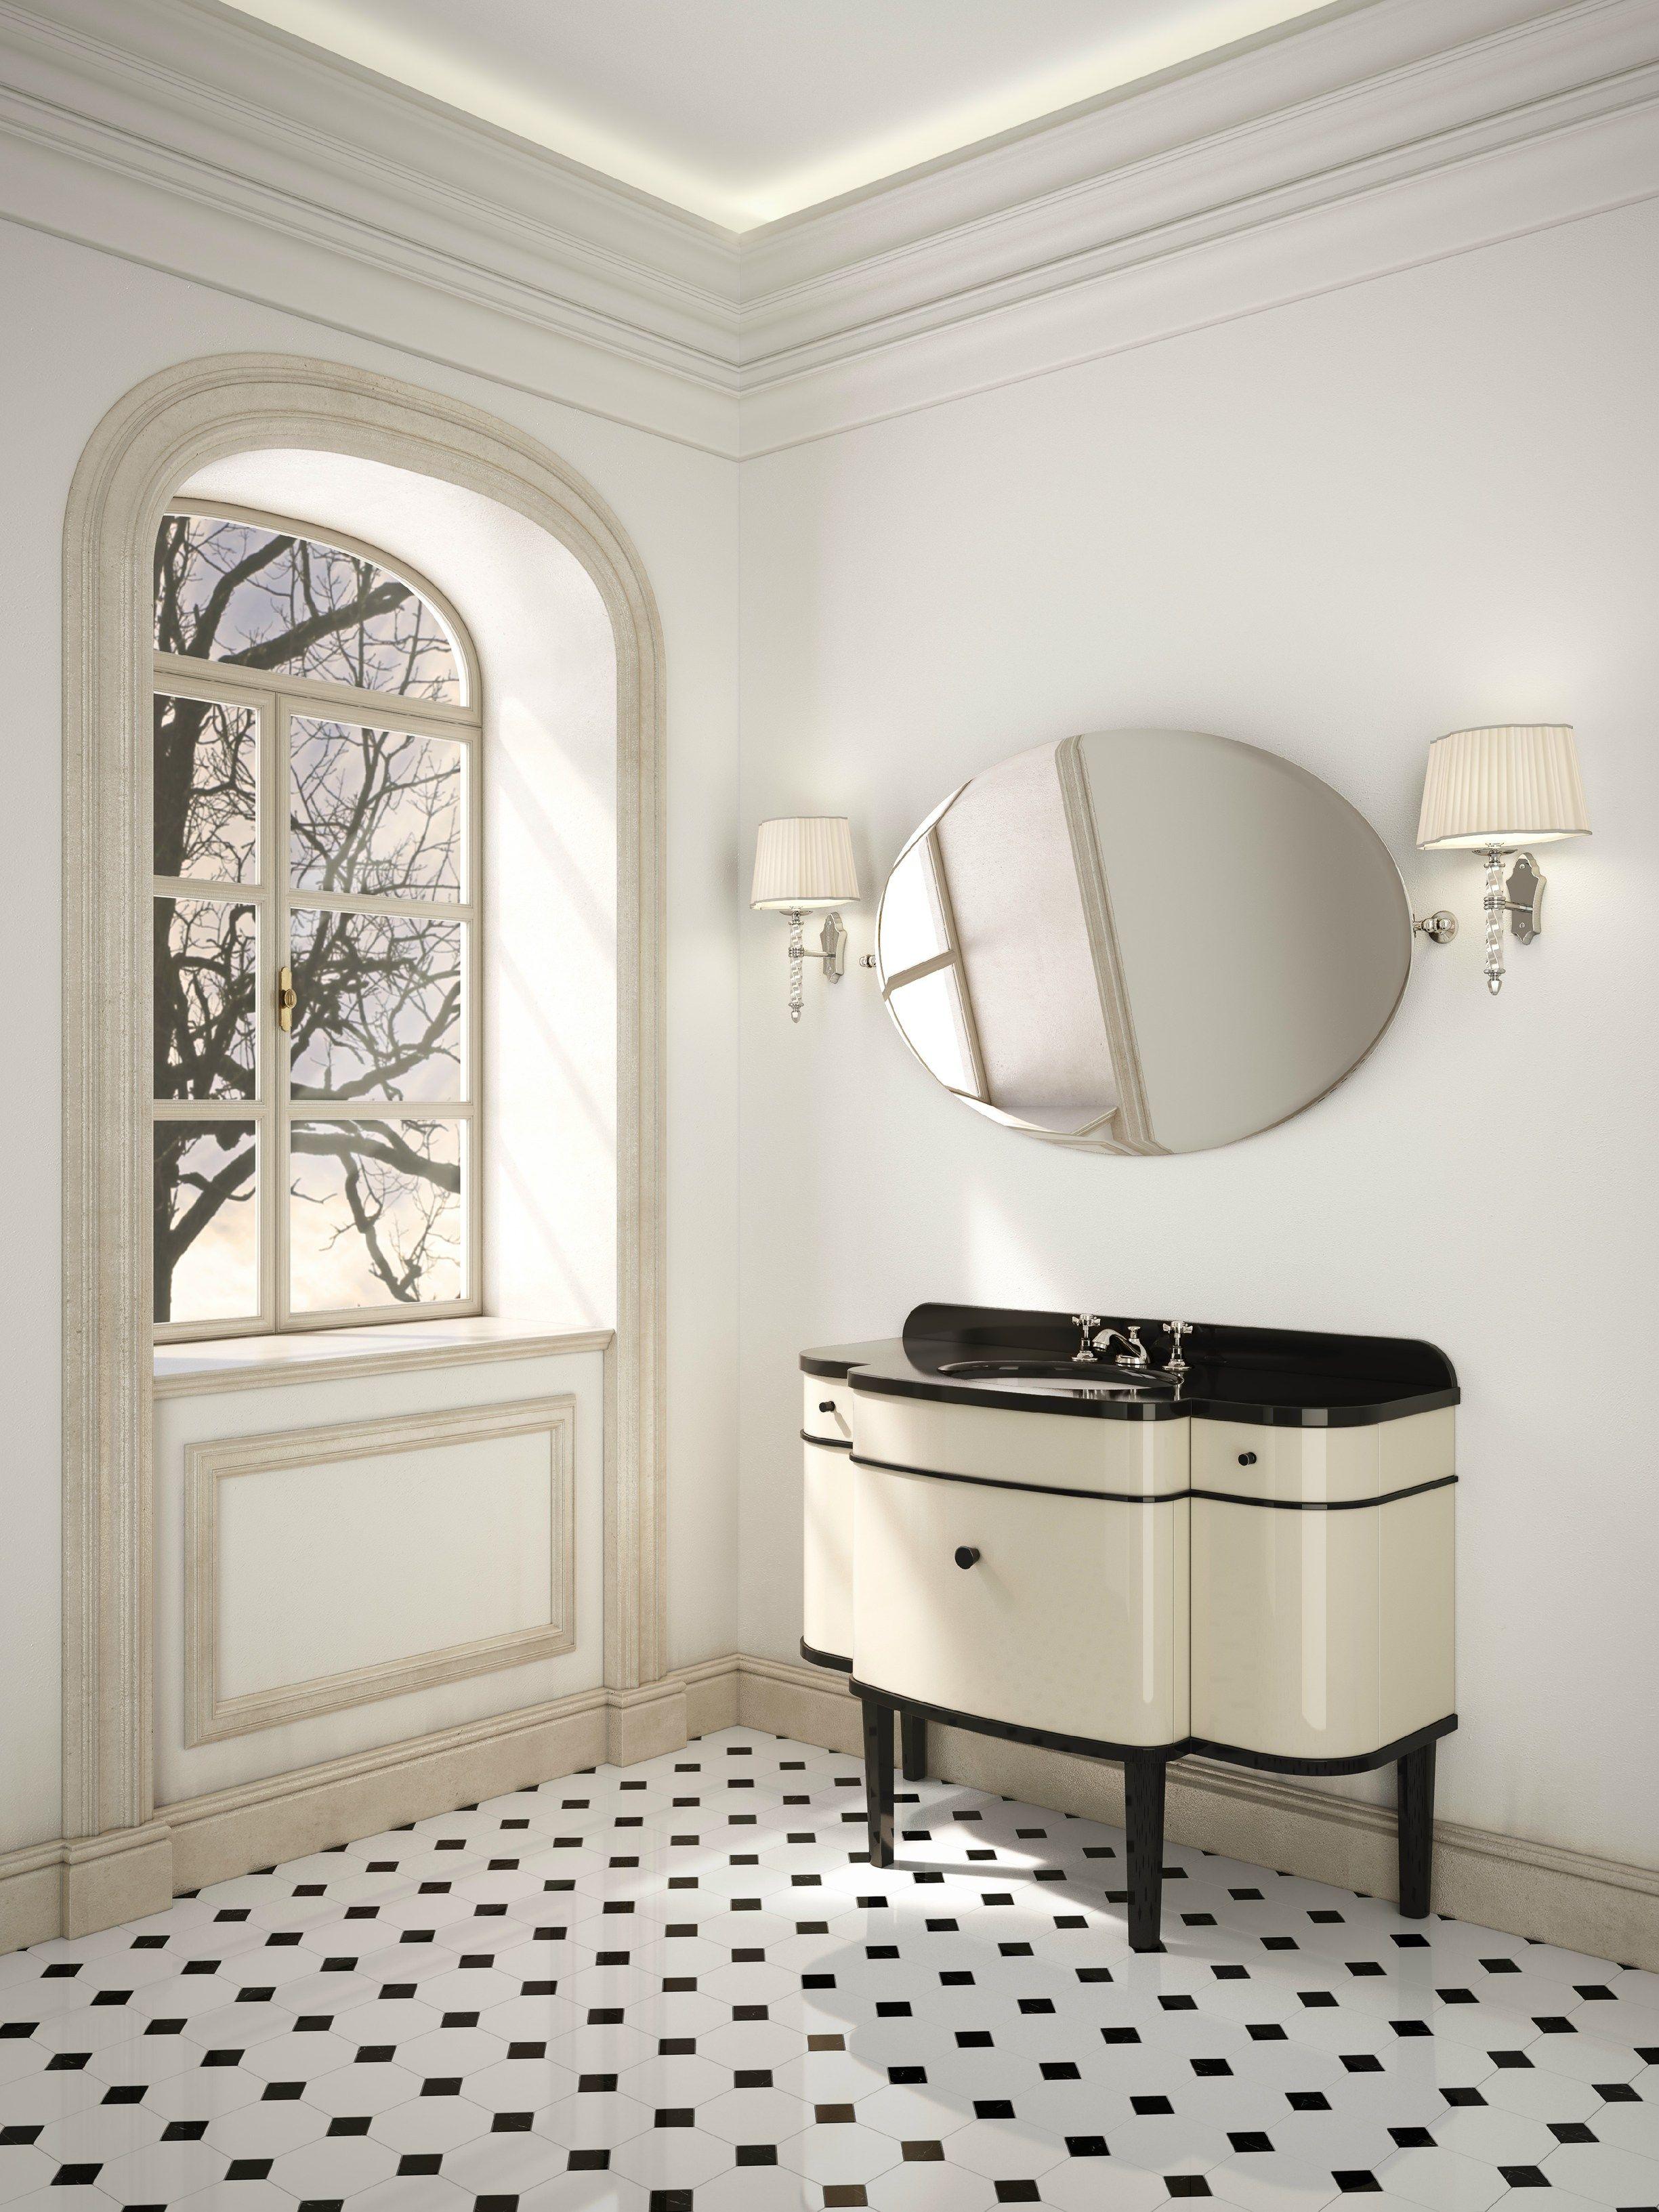 Art Deco Art Deco Badezimmer Art Deco Mobel Und Art Deco Stil